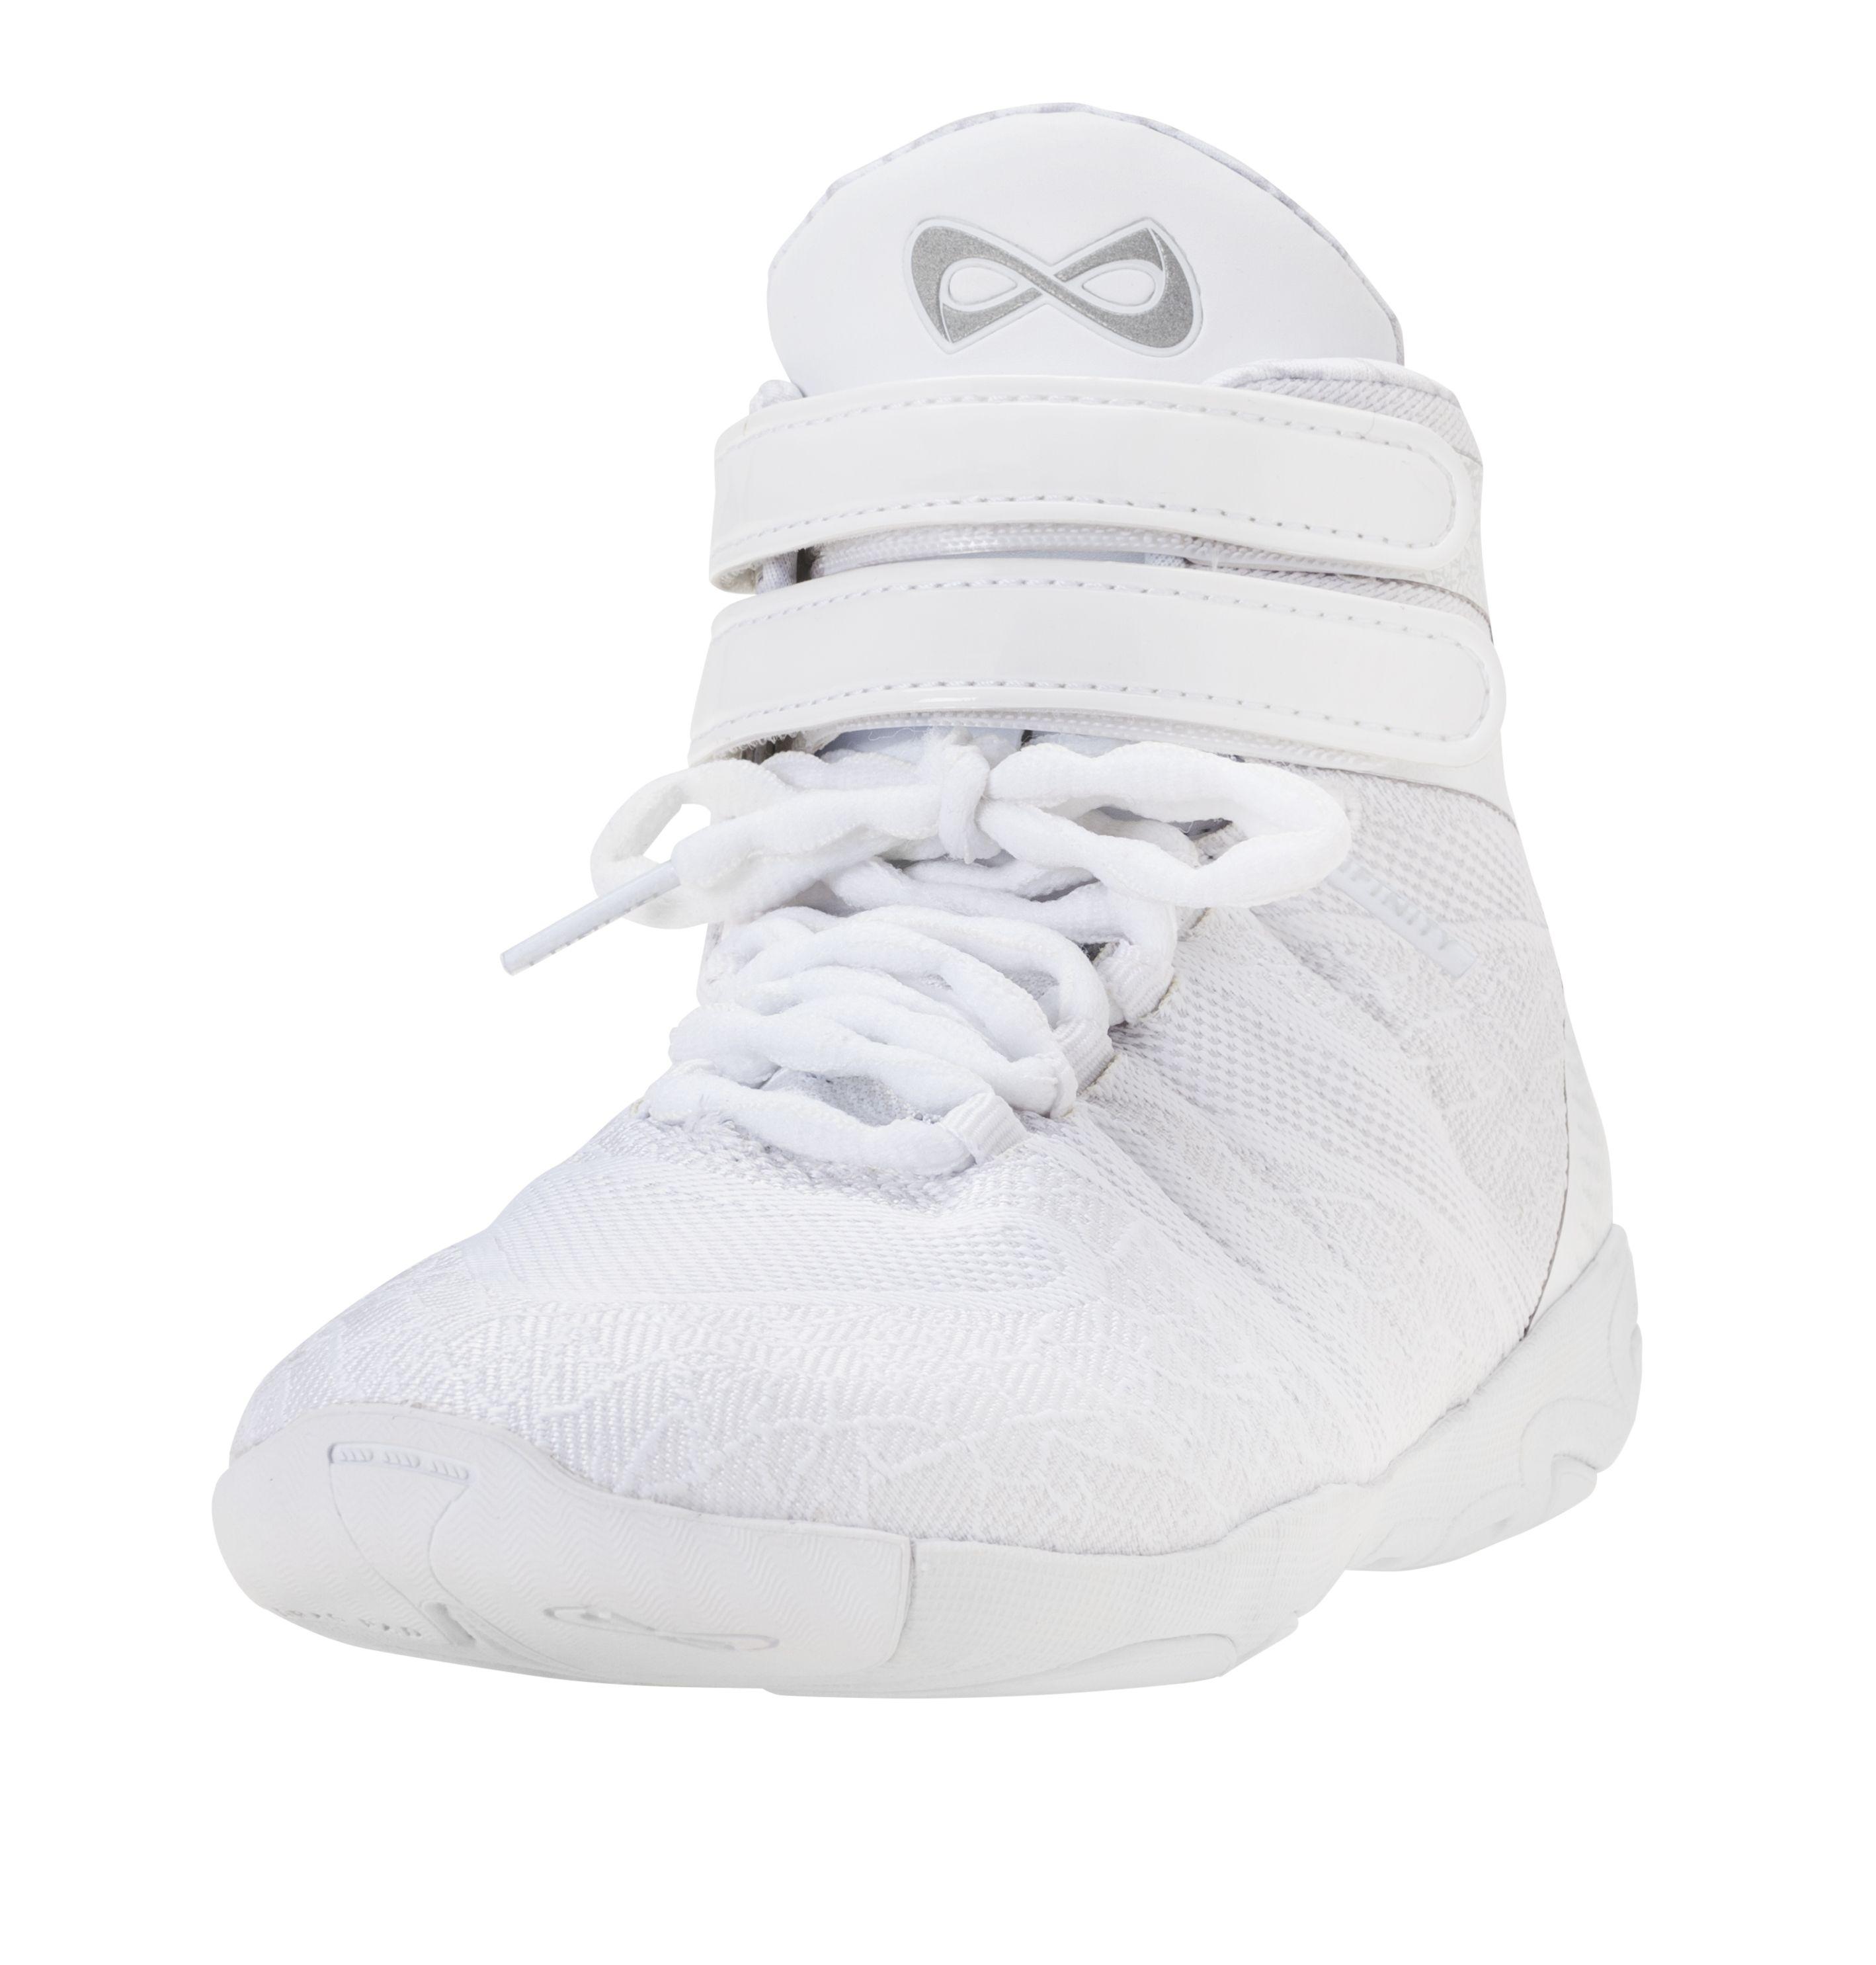 NFINITY TITAN SHOE $110 | Cheer shoes